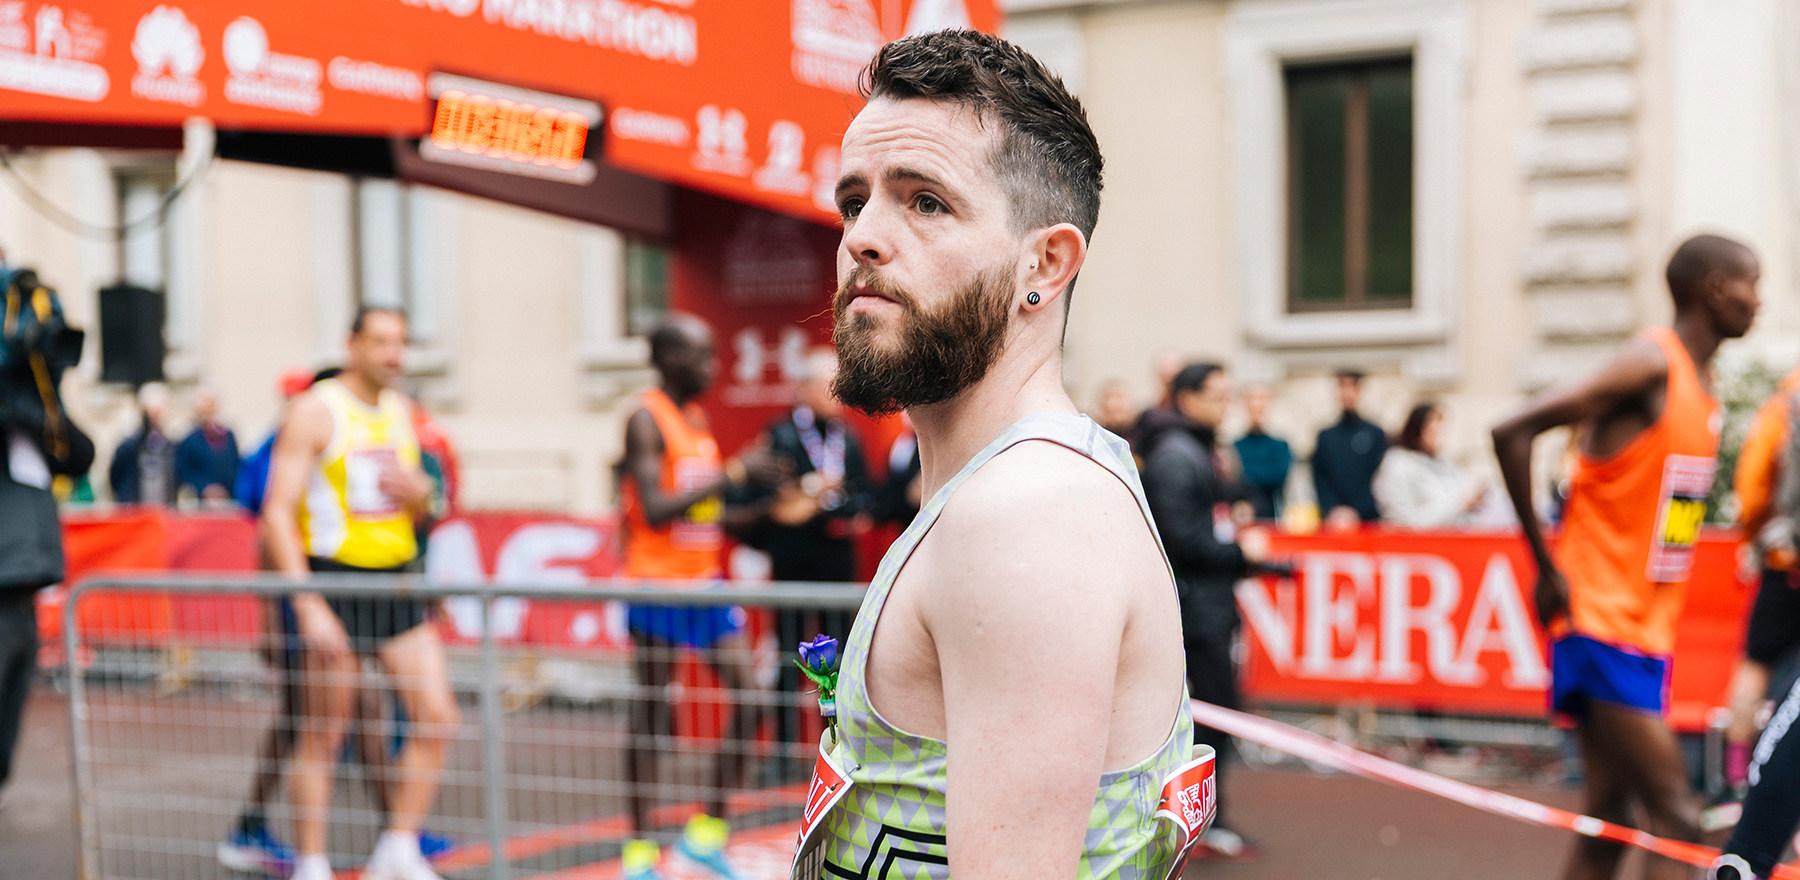 Before the start of the Milan Marathon